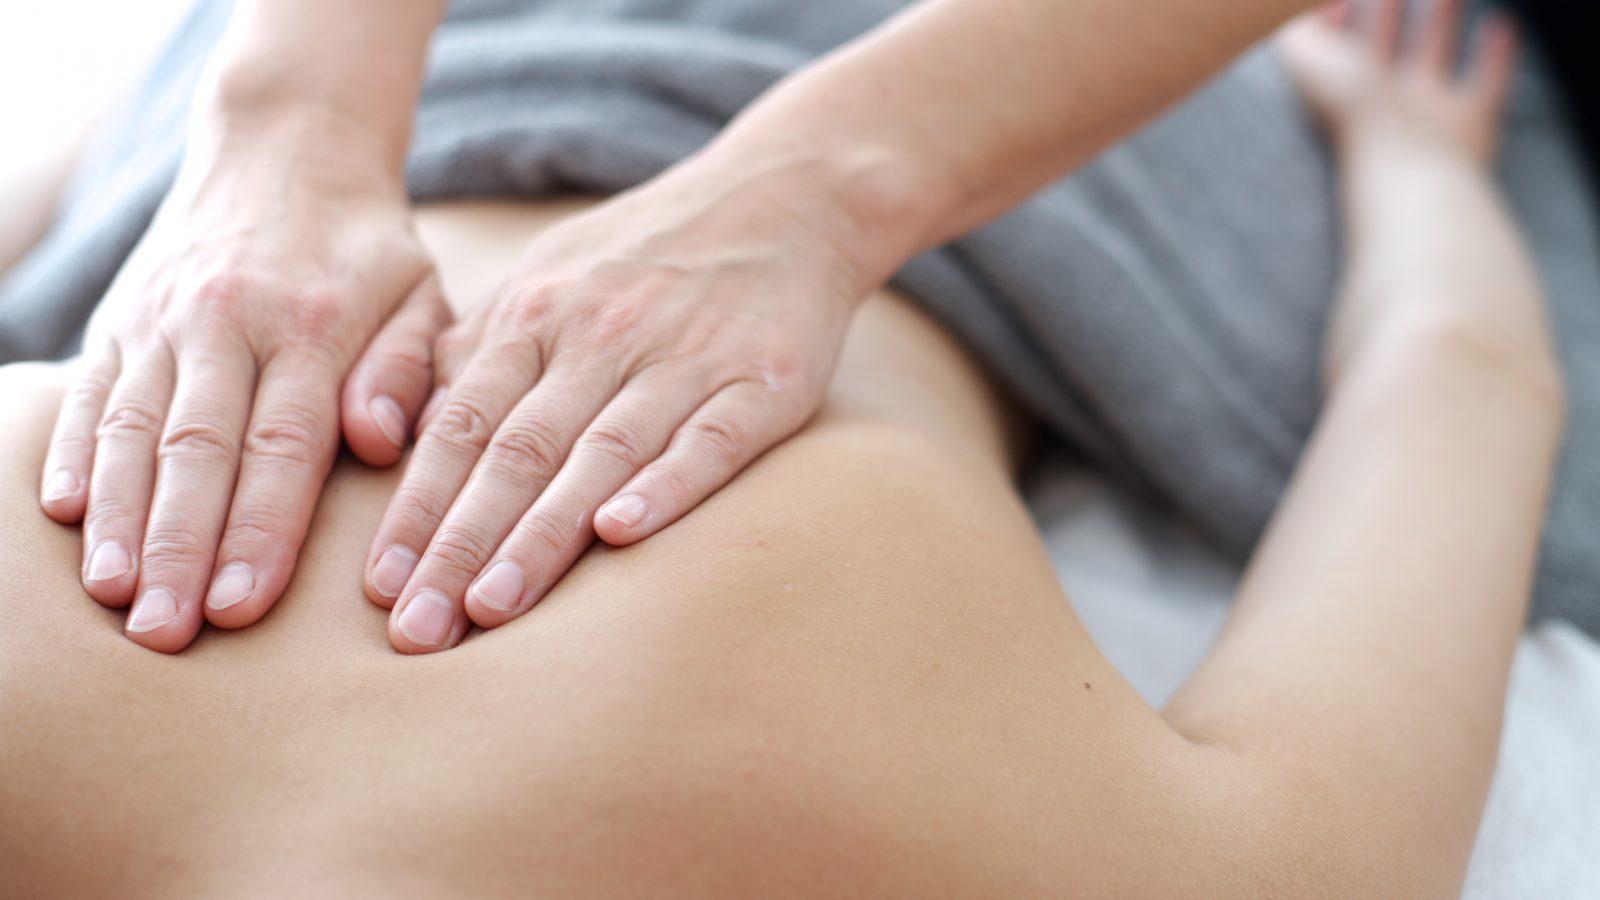 Marysville Classic Massage Clinic